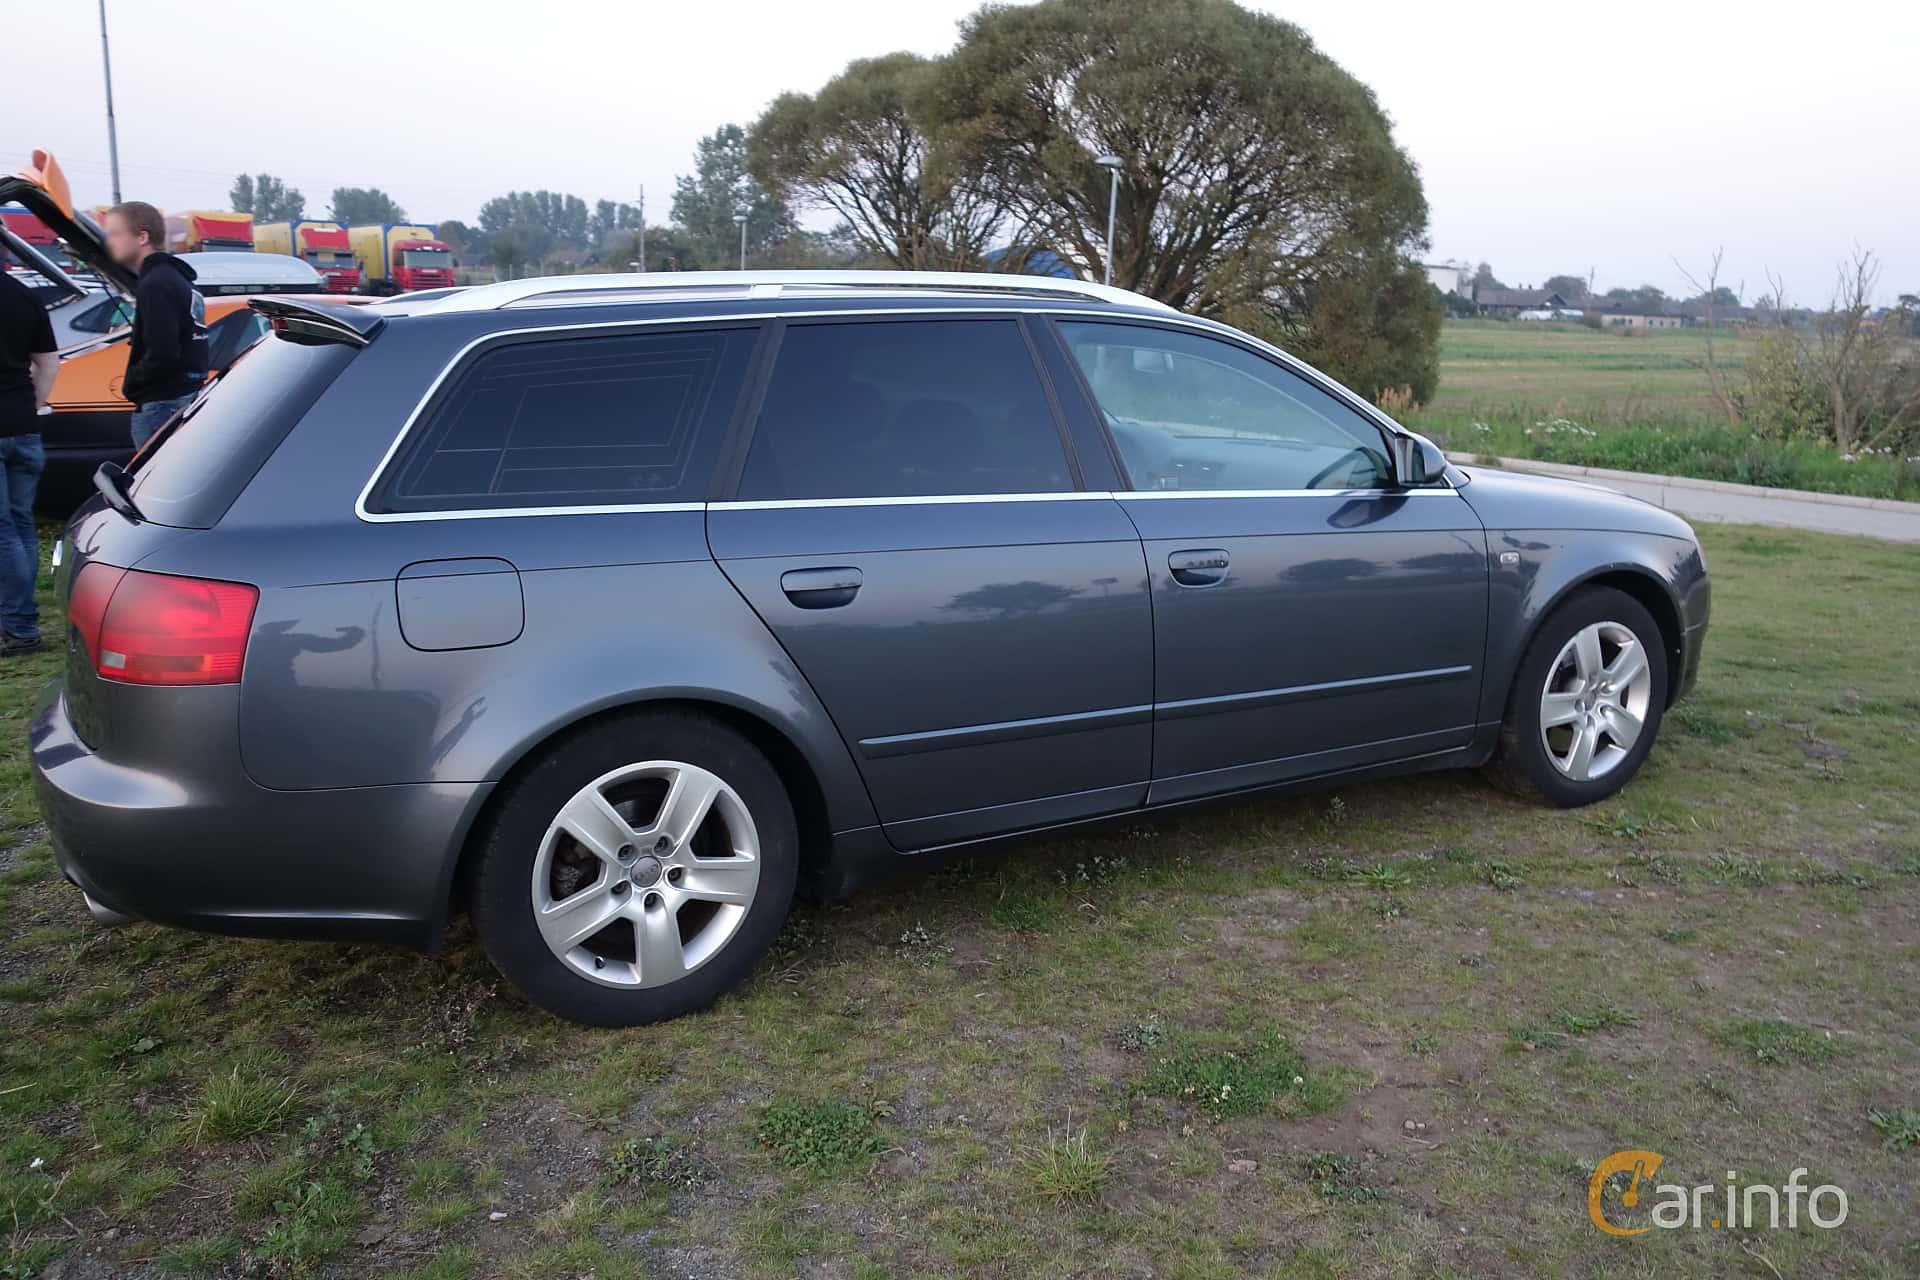 Kelebihan Kekurangan Audi 2005 Murah Berkualitas